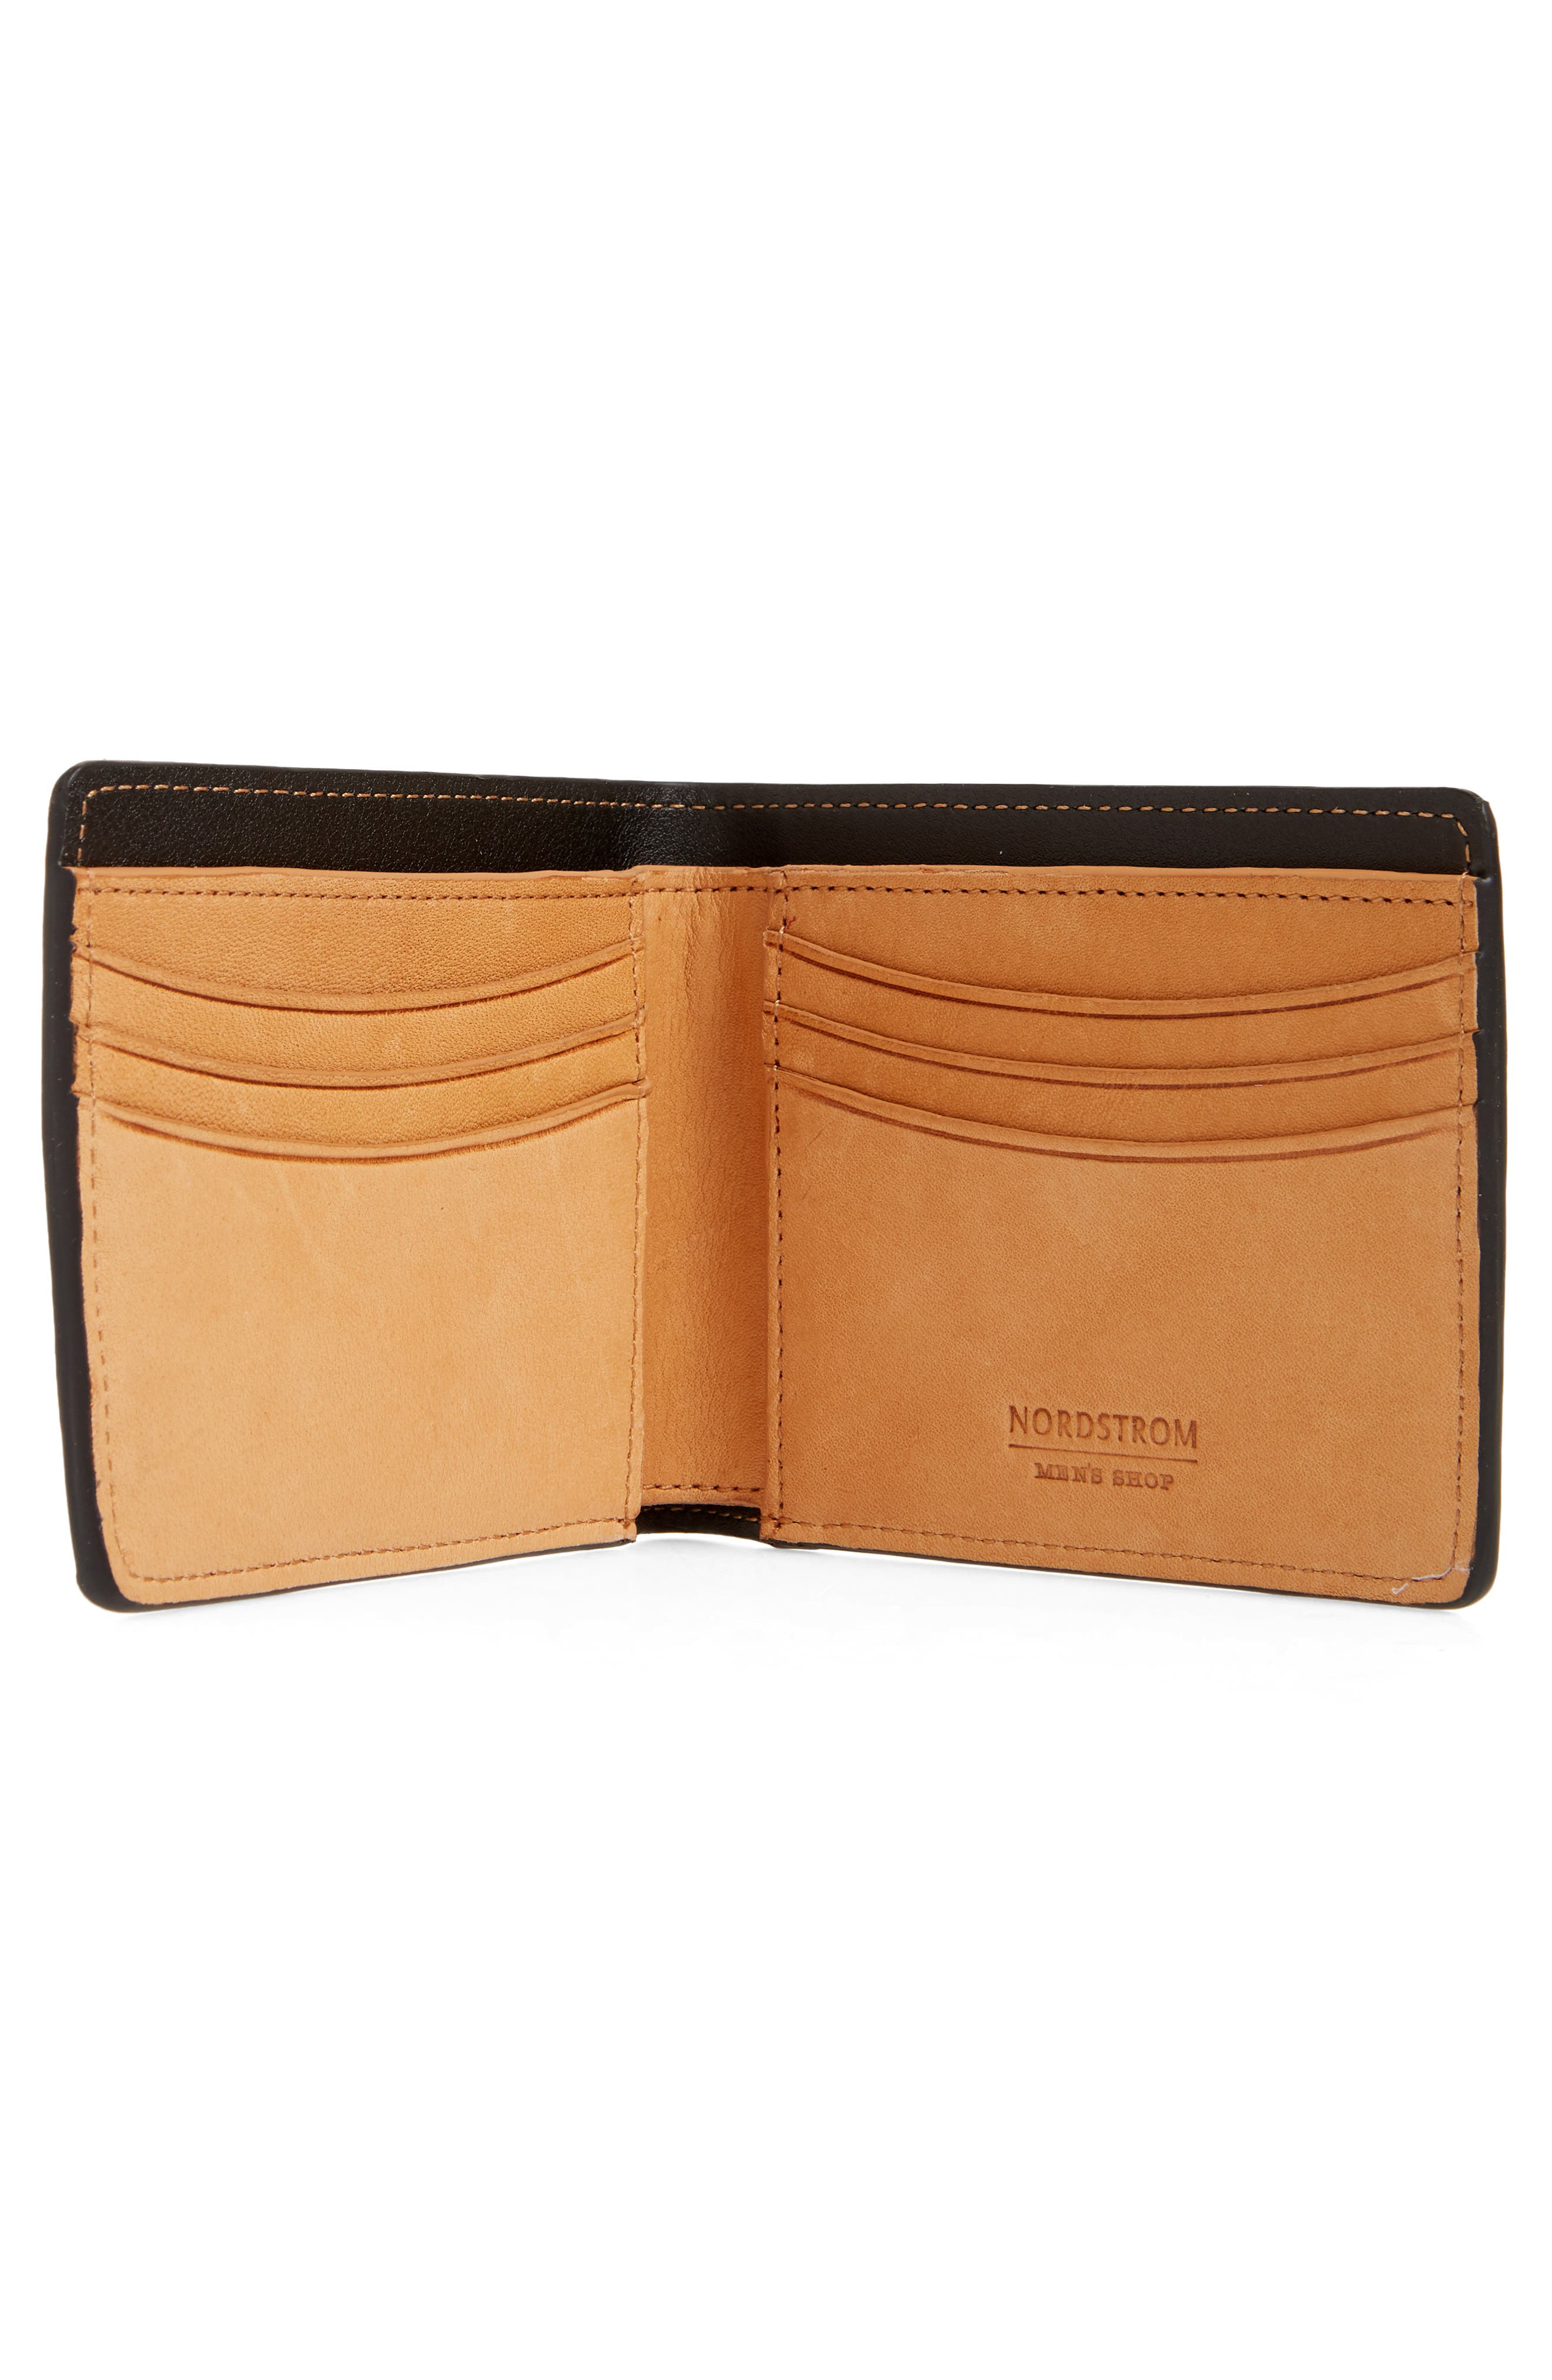 Darien Leather Wallet,                             Alternate thumbnail 2, color,                             Black